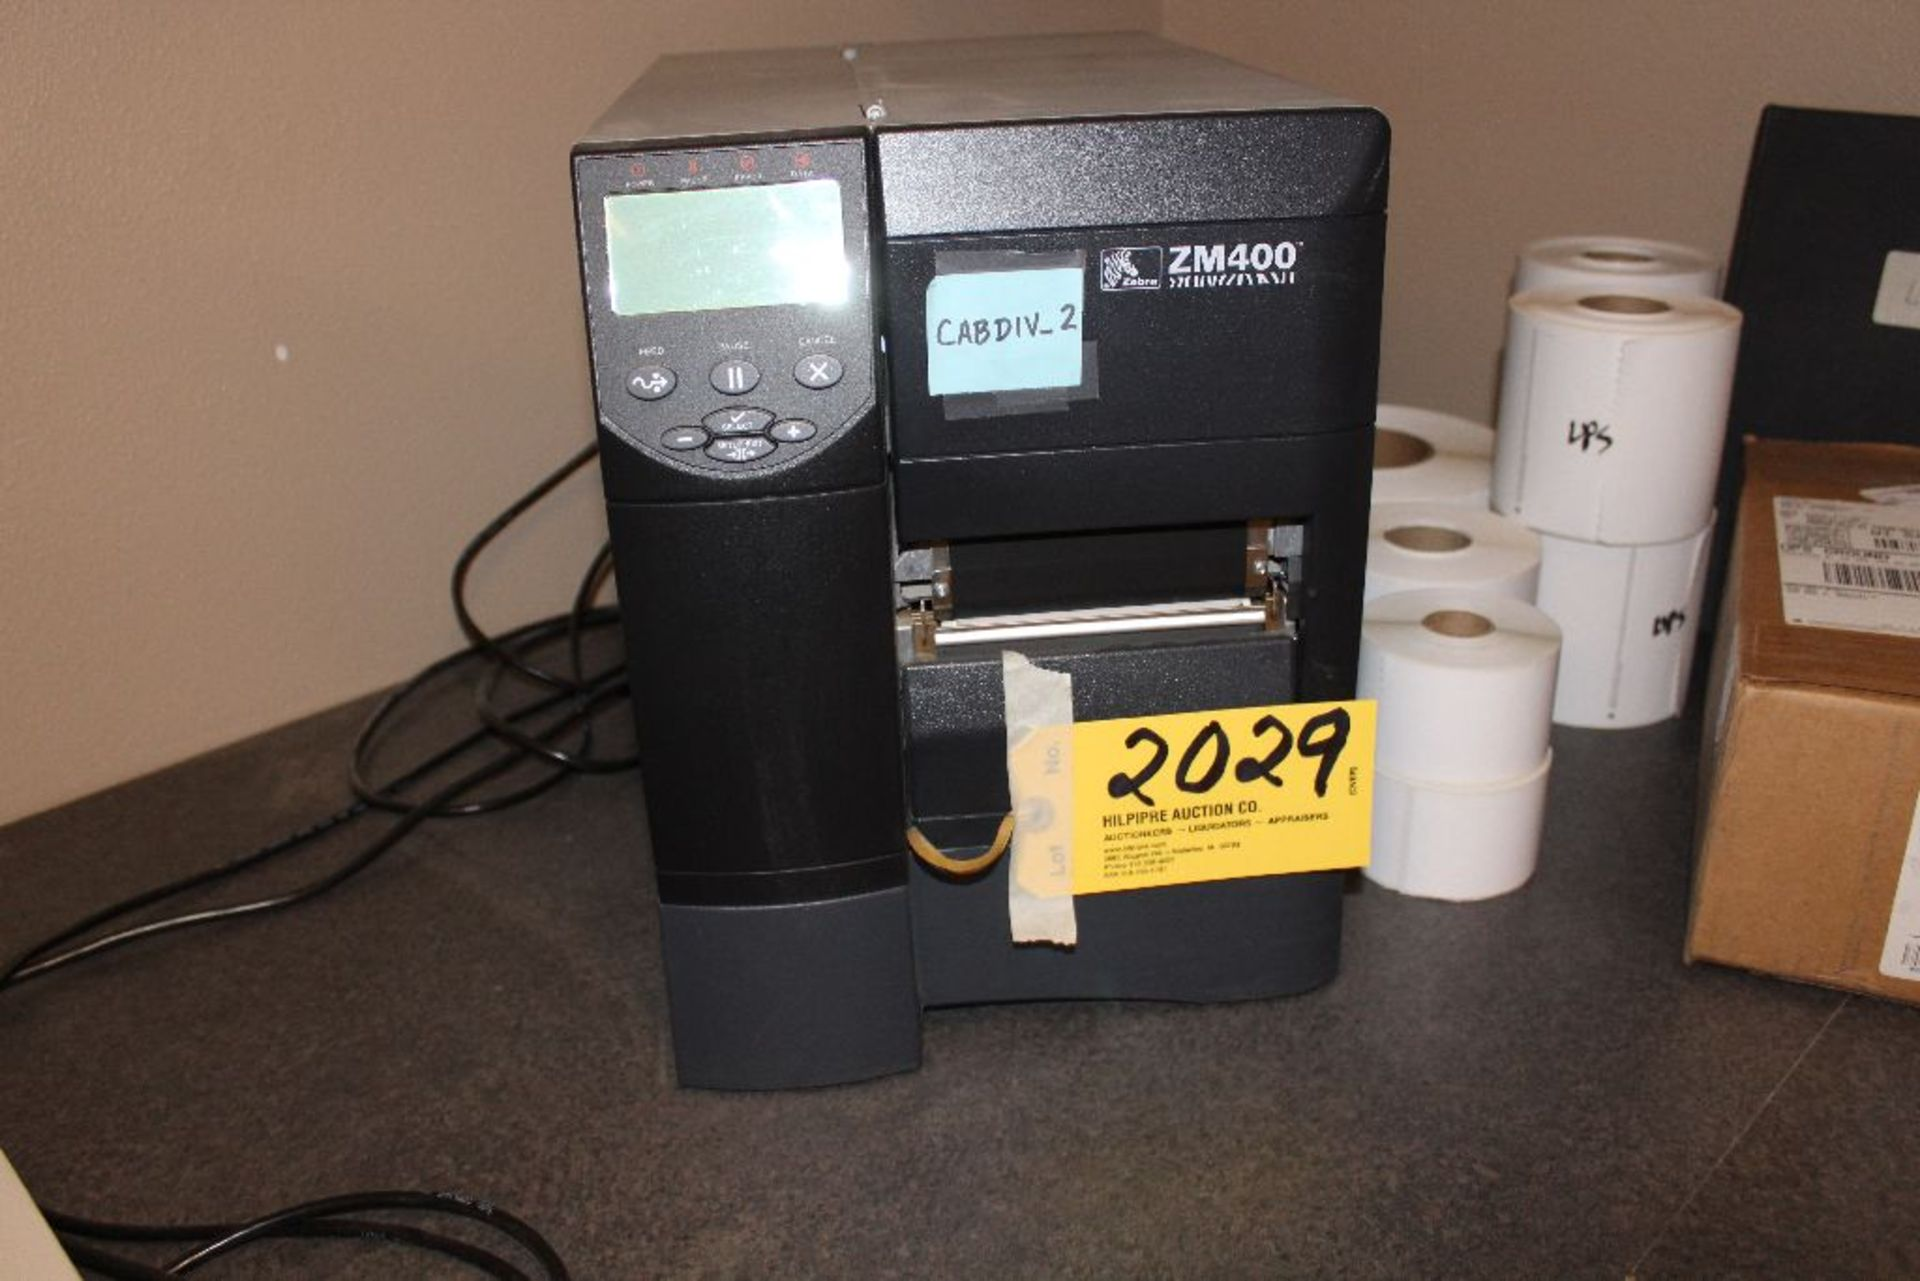 Lot 2029 - Zebra ZM400 label printer and printing label supplies.